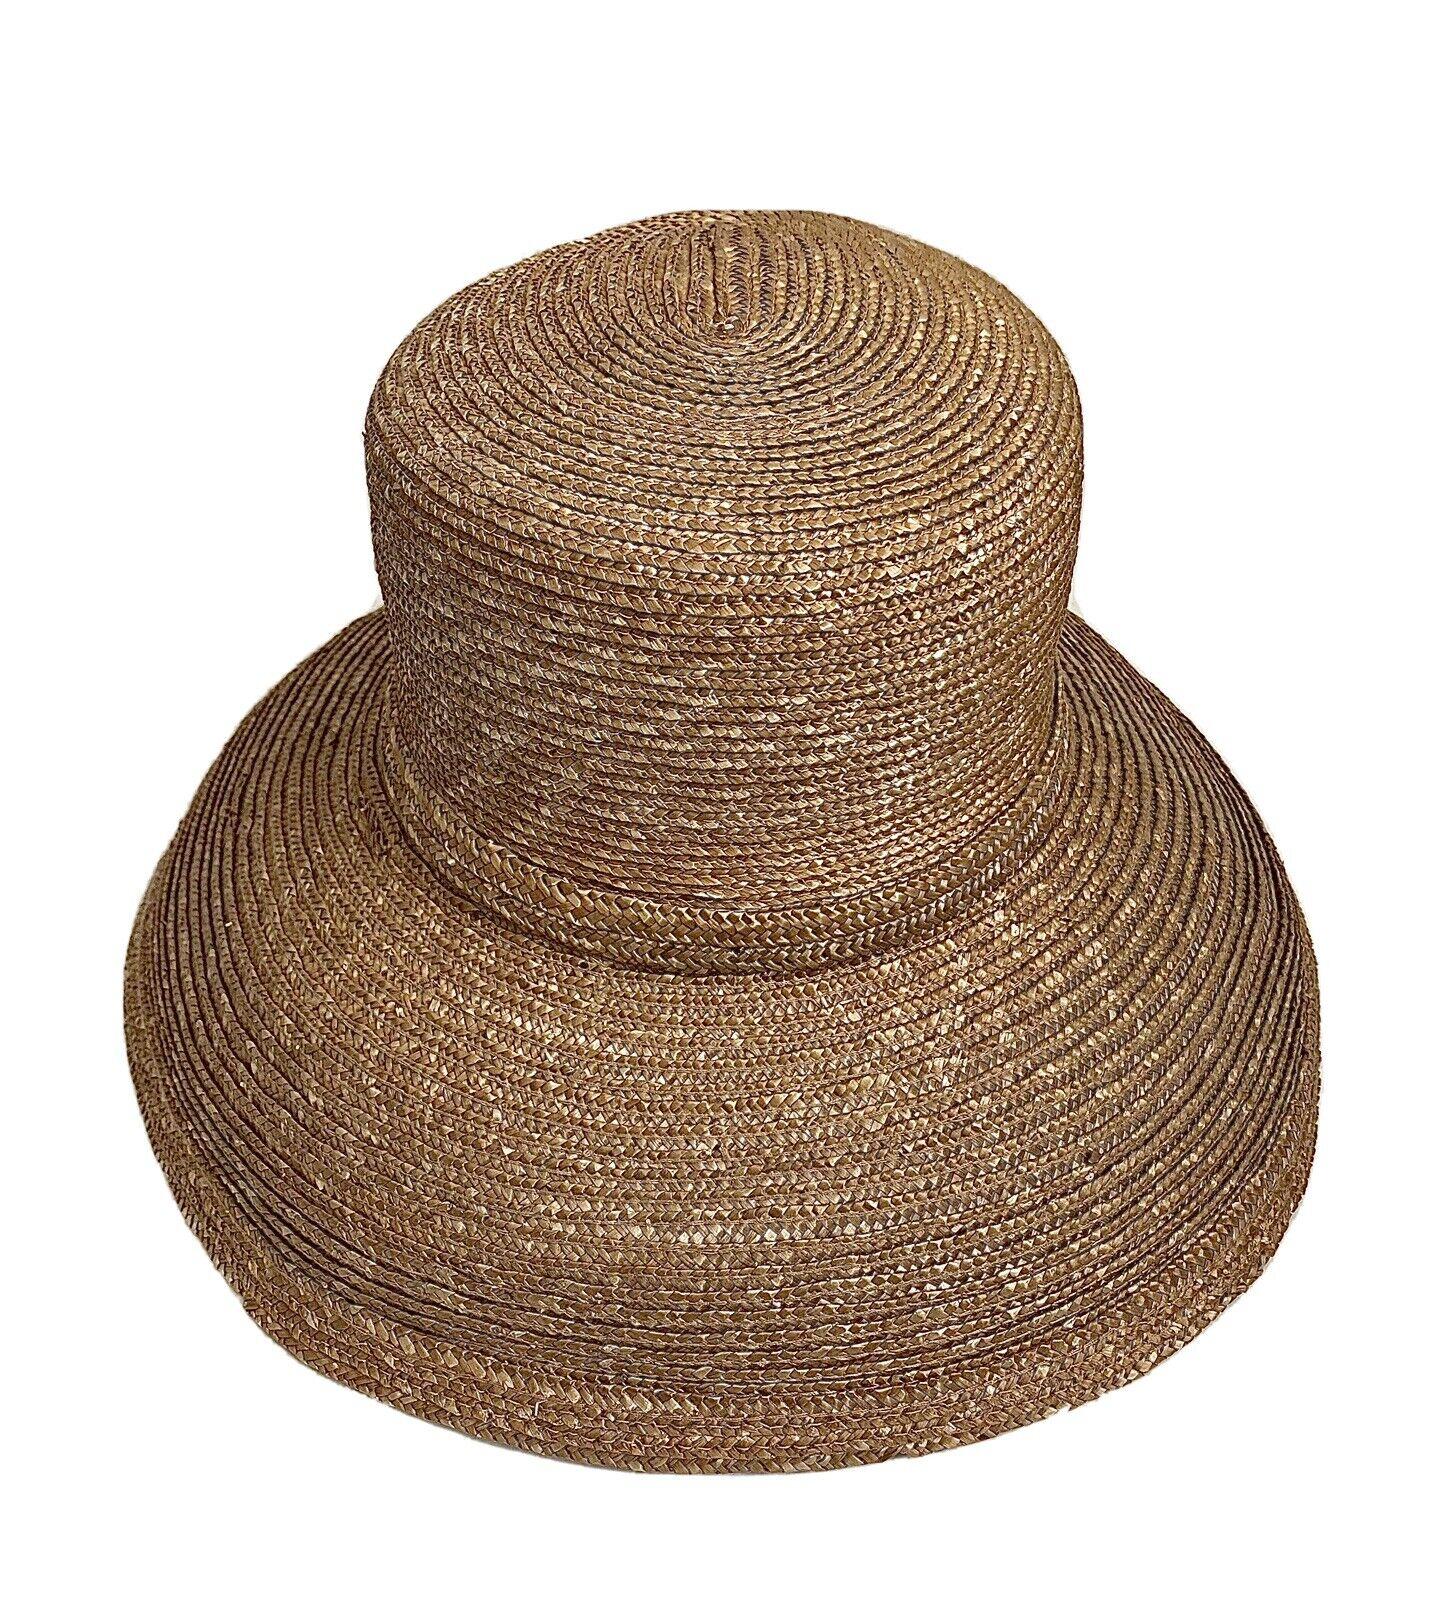 Eric Javits Straw Rolled Brim Hat - image 1